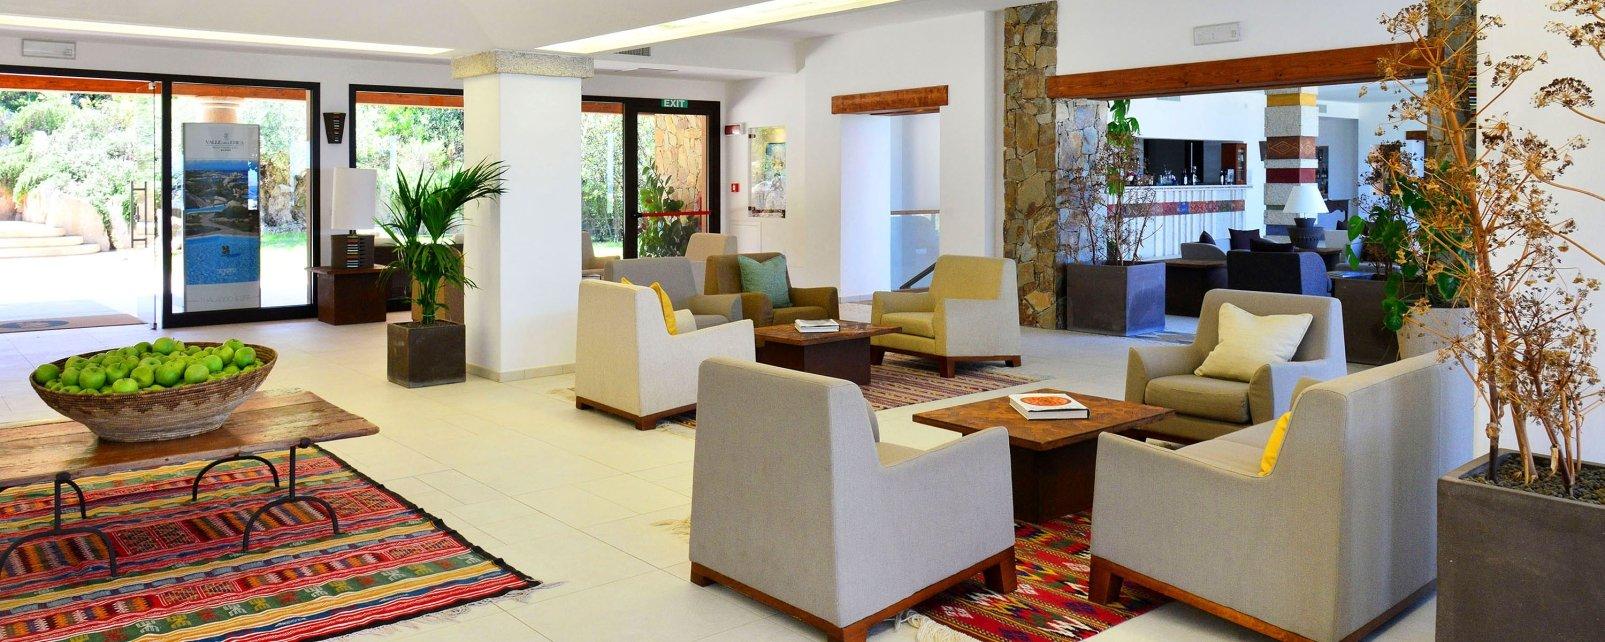 Hotel Resort Valle dell'Erica Thalasso & SPA